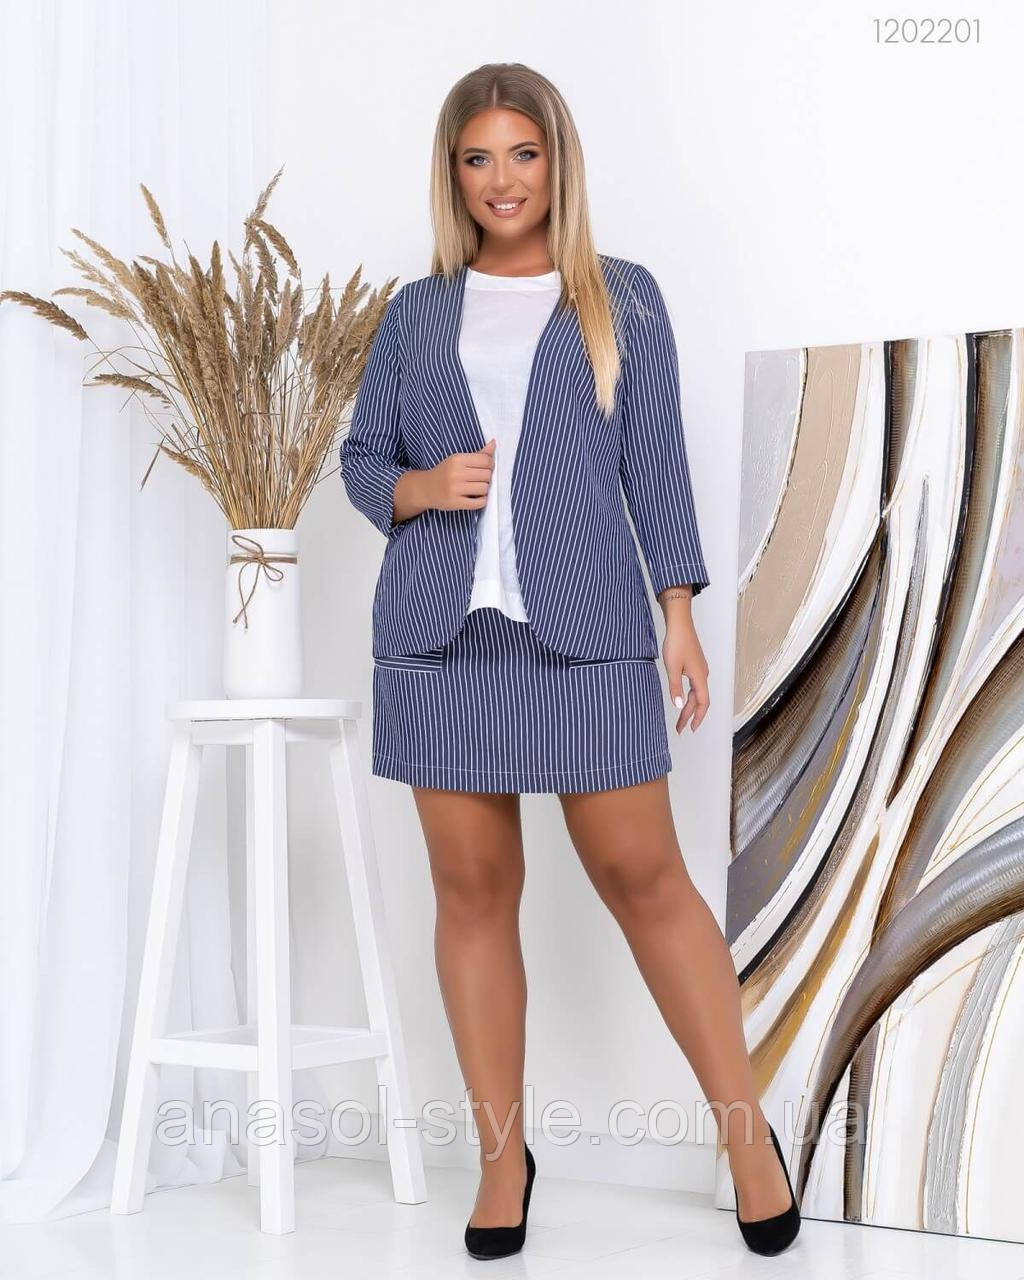 Женский костюм Шикотан (синий) 1202201